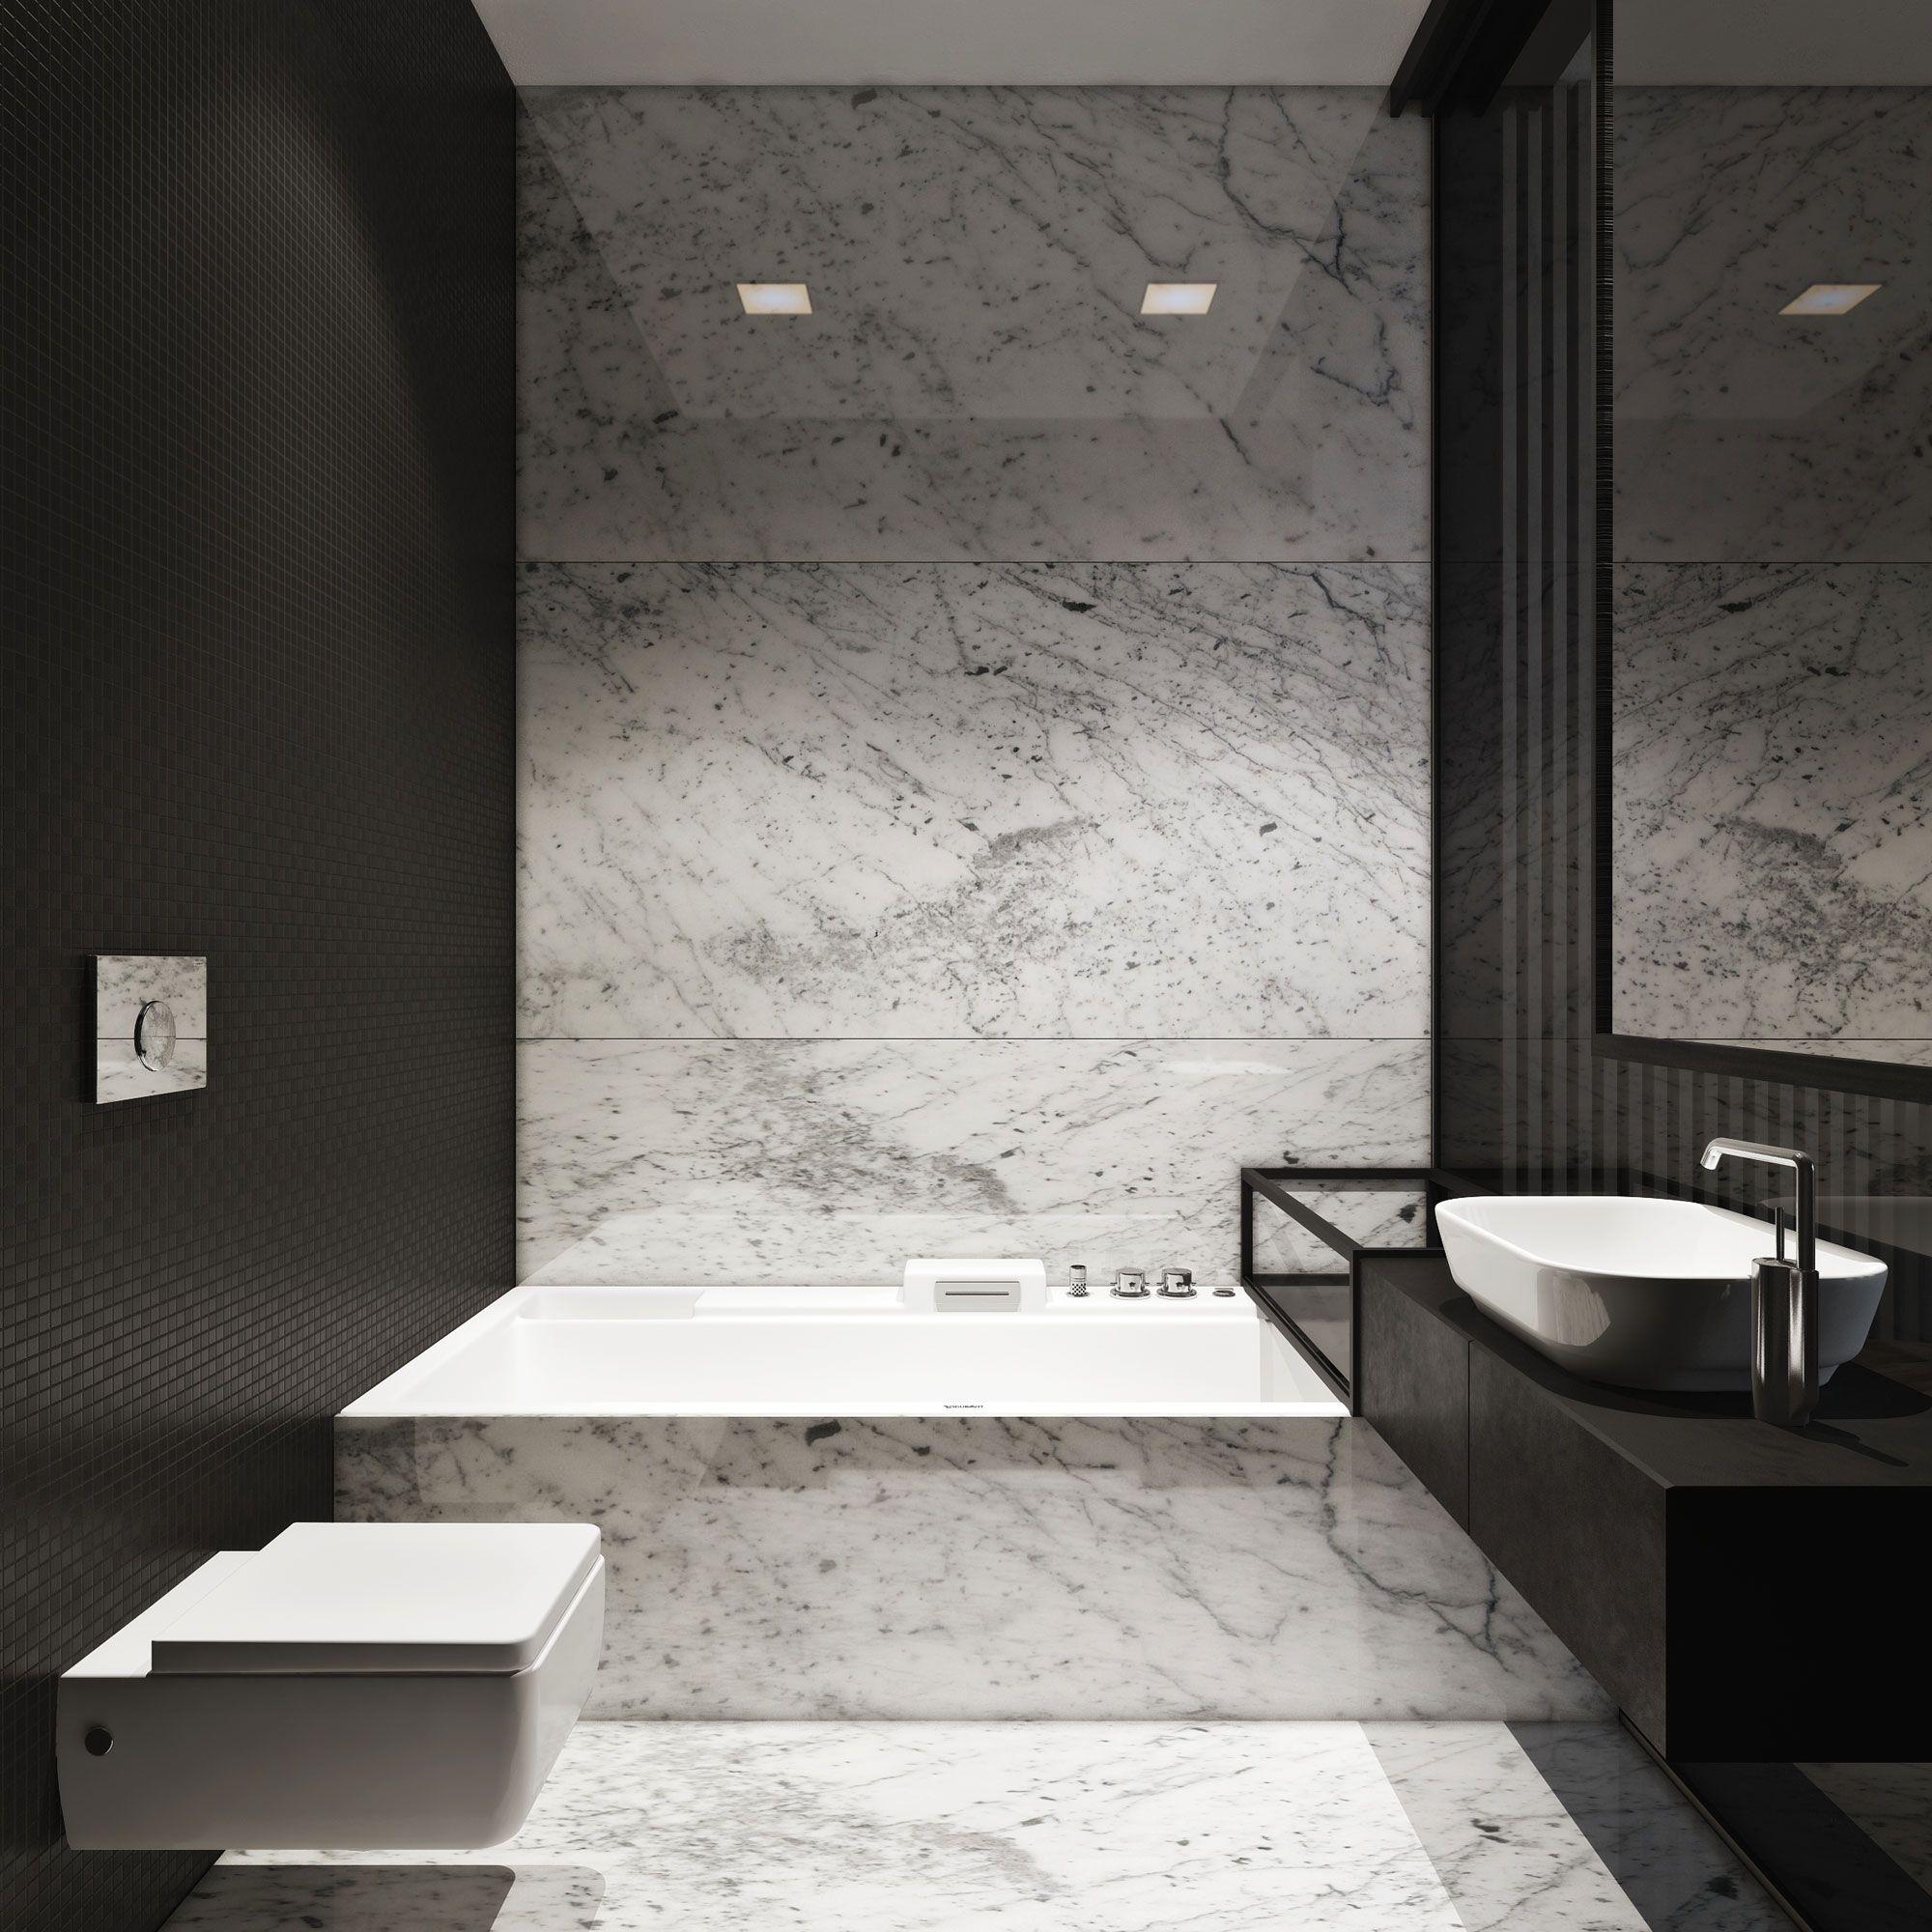 M :: Townhouse by Igor Sirotov Architect #bathroom #marble #carrara Modern Contemporary & M :: Townhouse by Igor Sirotov Architect #bathroom #marble #carrara ...